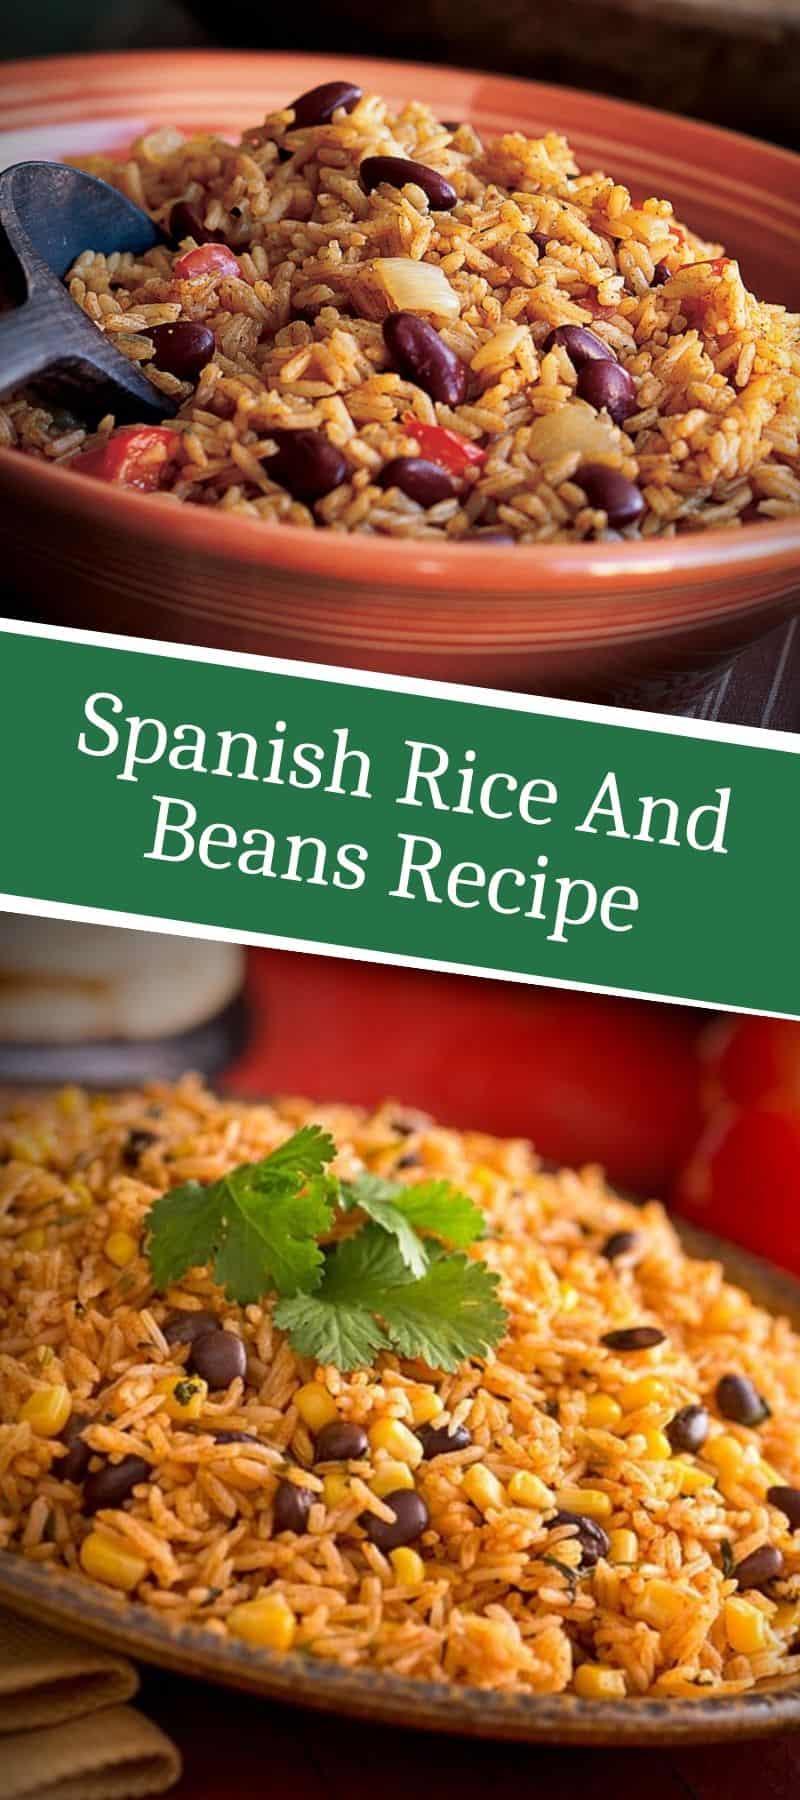 Spanish Rice And Beans Recipe 3